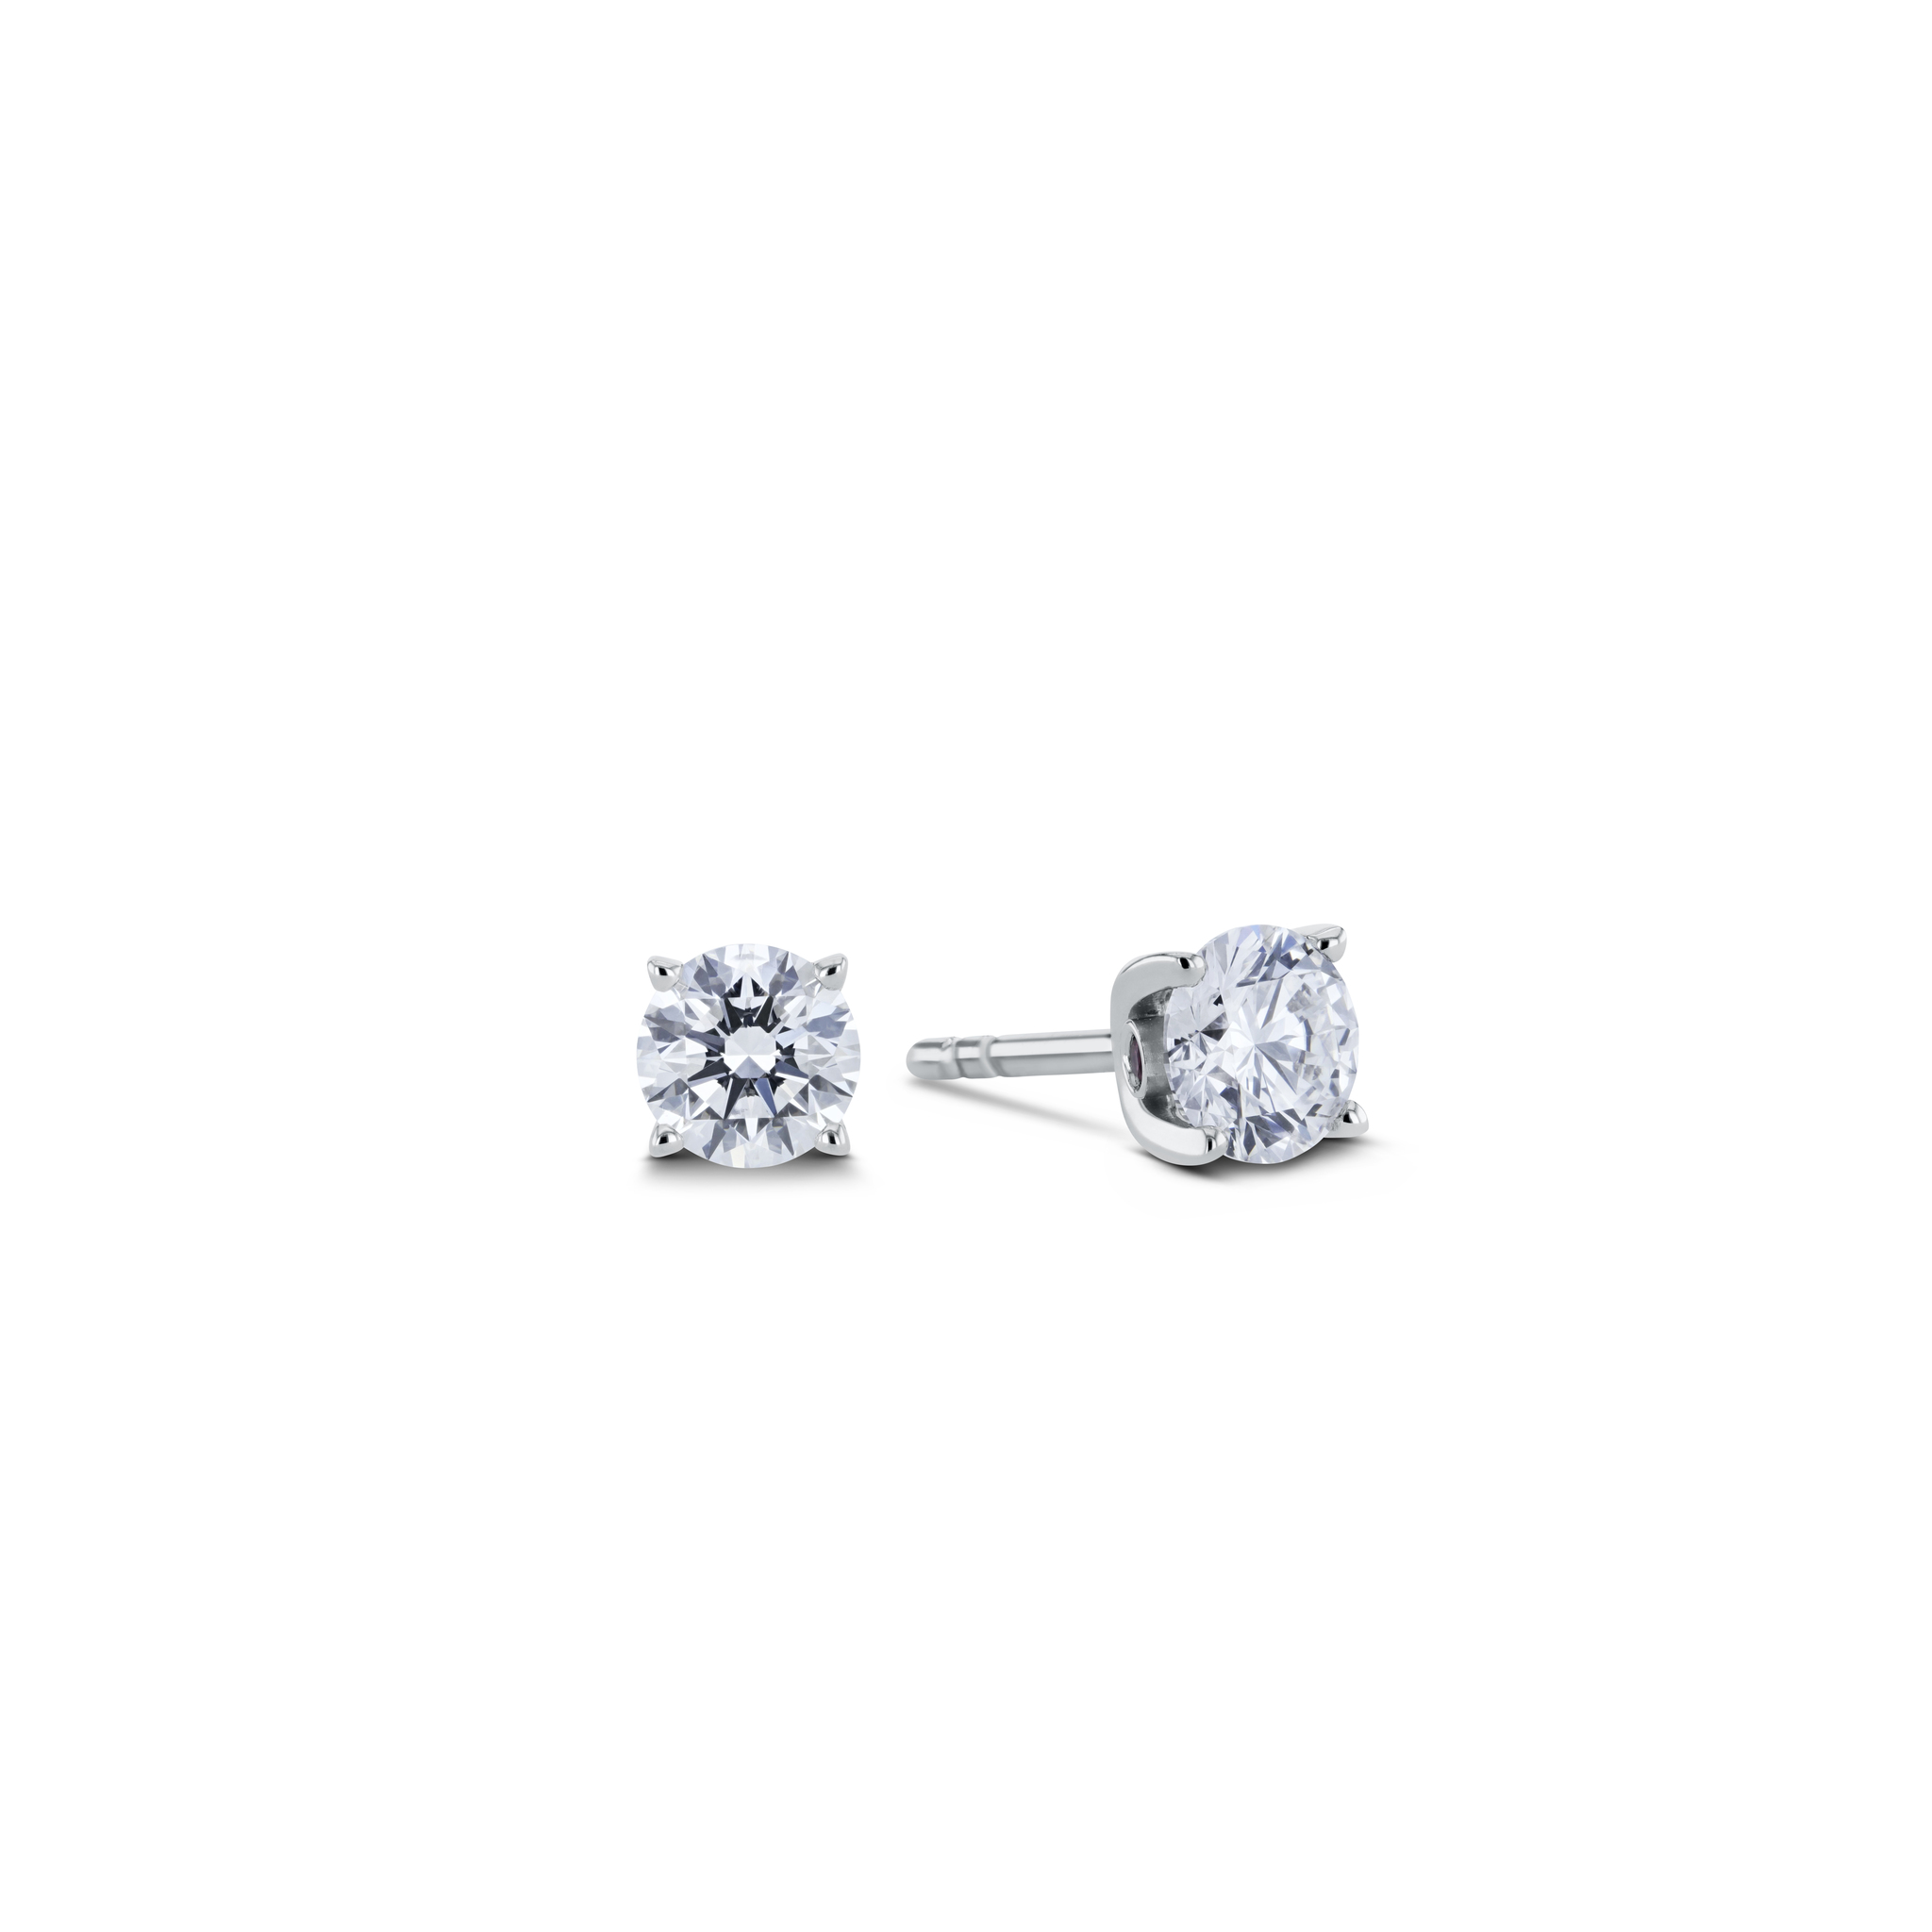 Solitär Ohrringe mit Diamanten